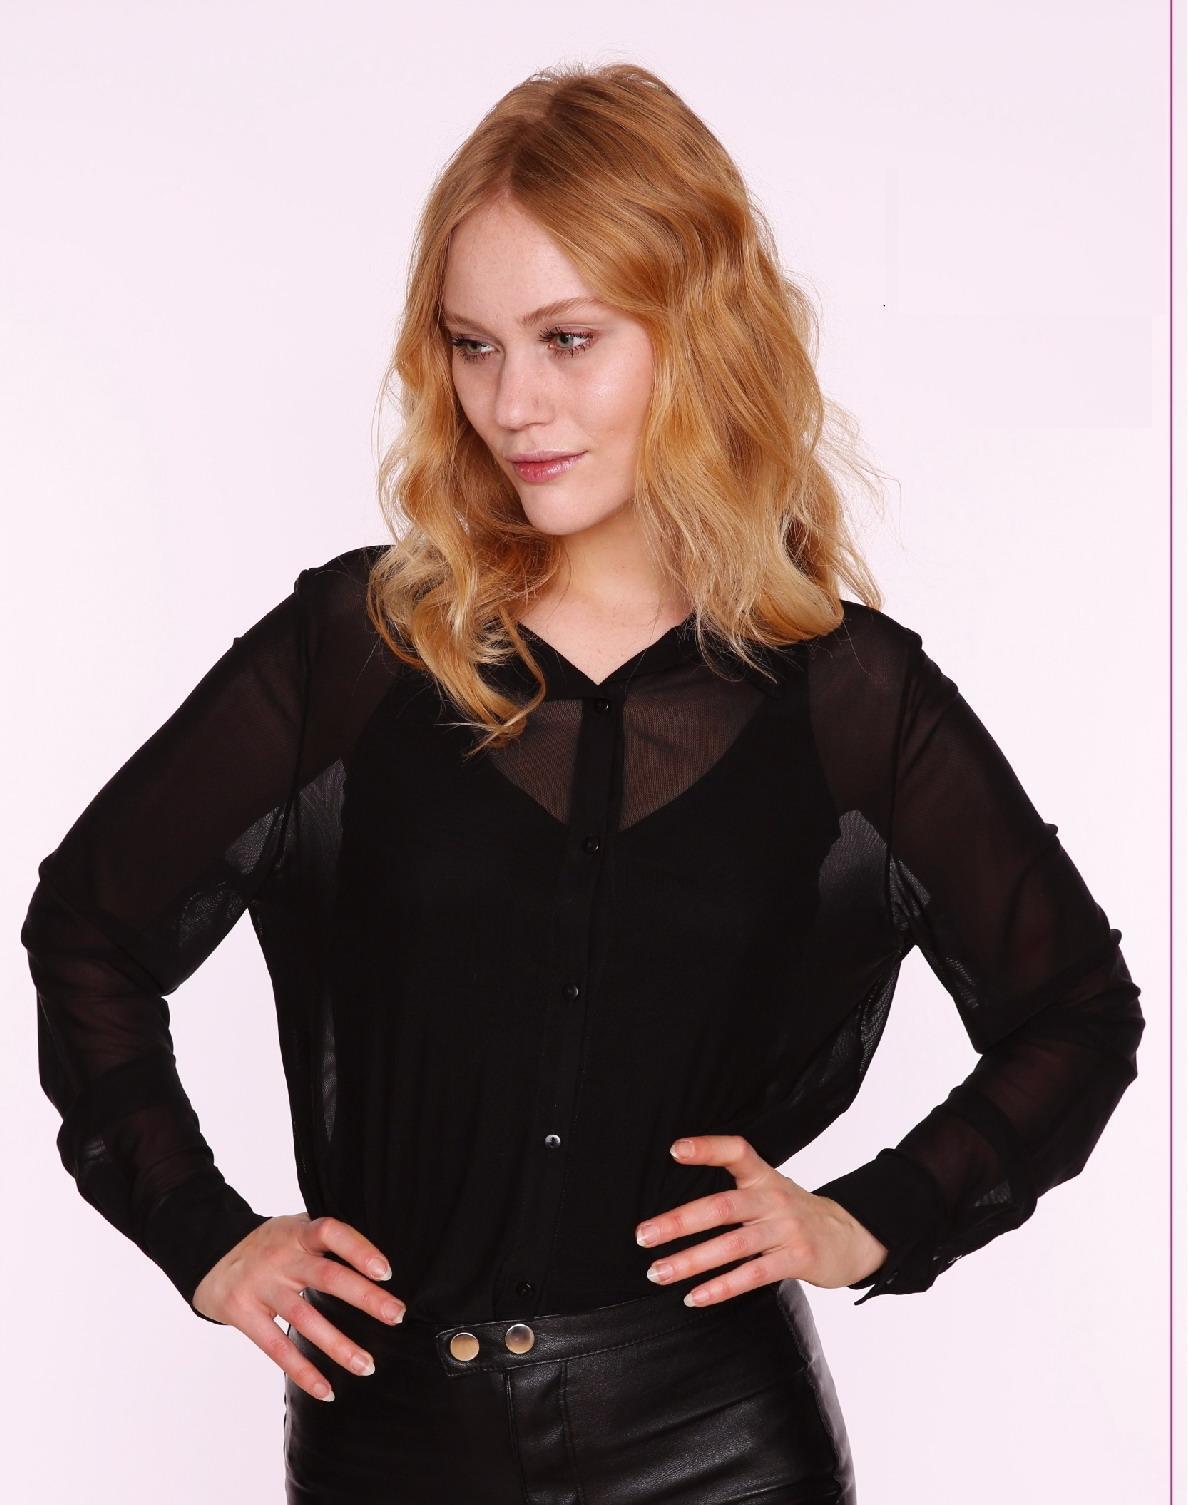 2017 Women′s Sexy Shirt Make of Polyester Elastane or Nylon Elastae Mesh Fabric